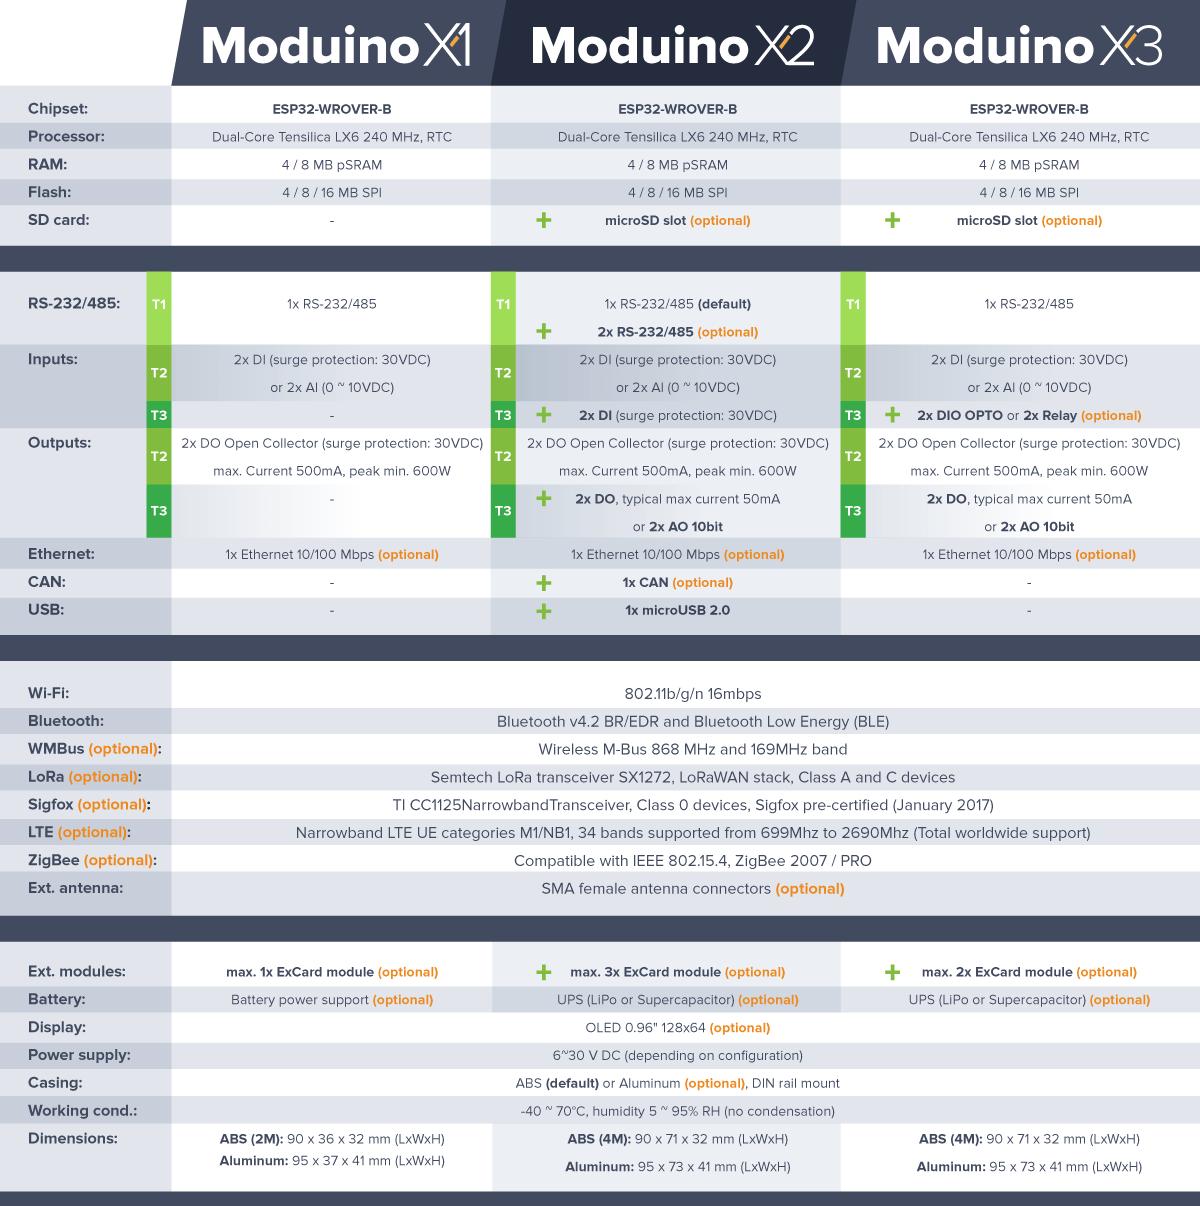 Moduino ESP32 comparison